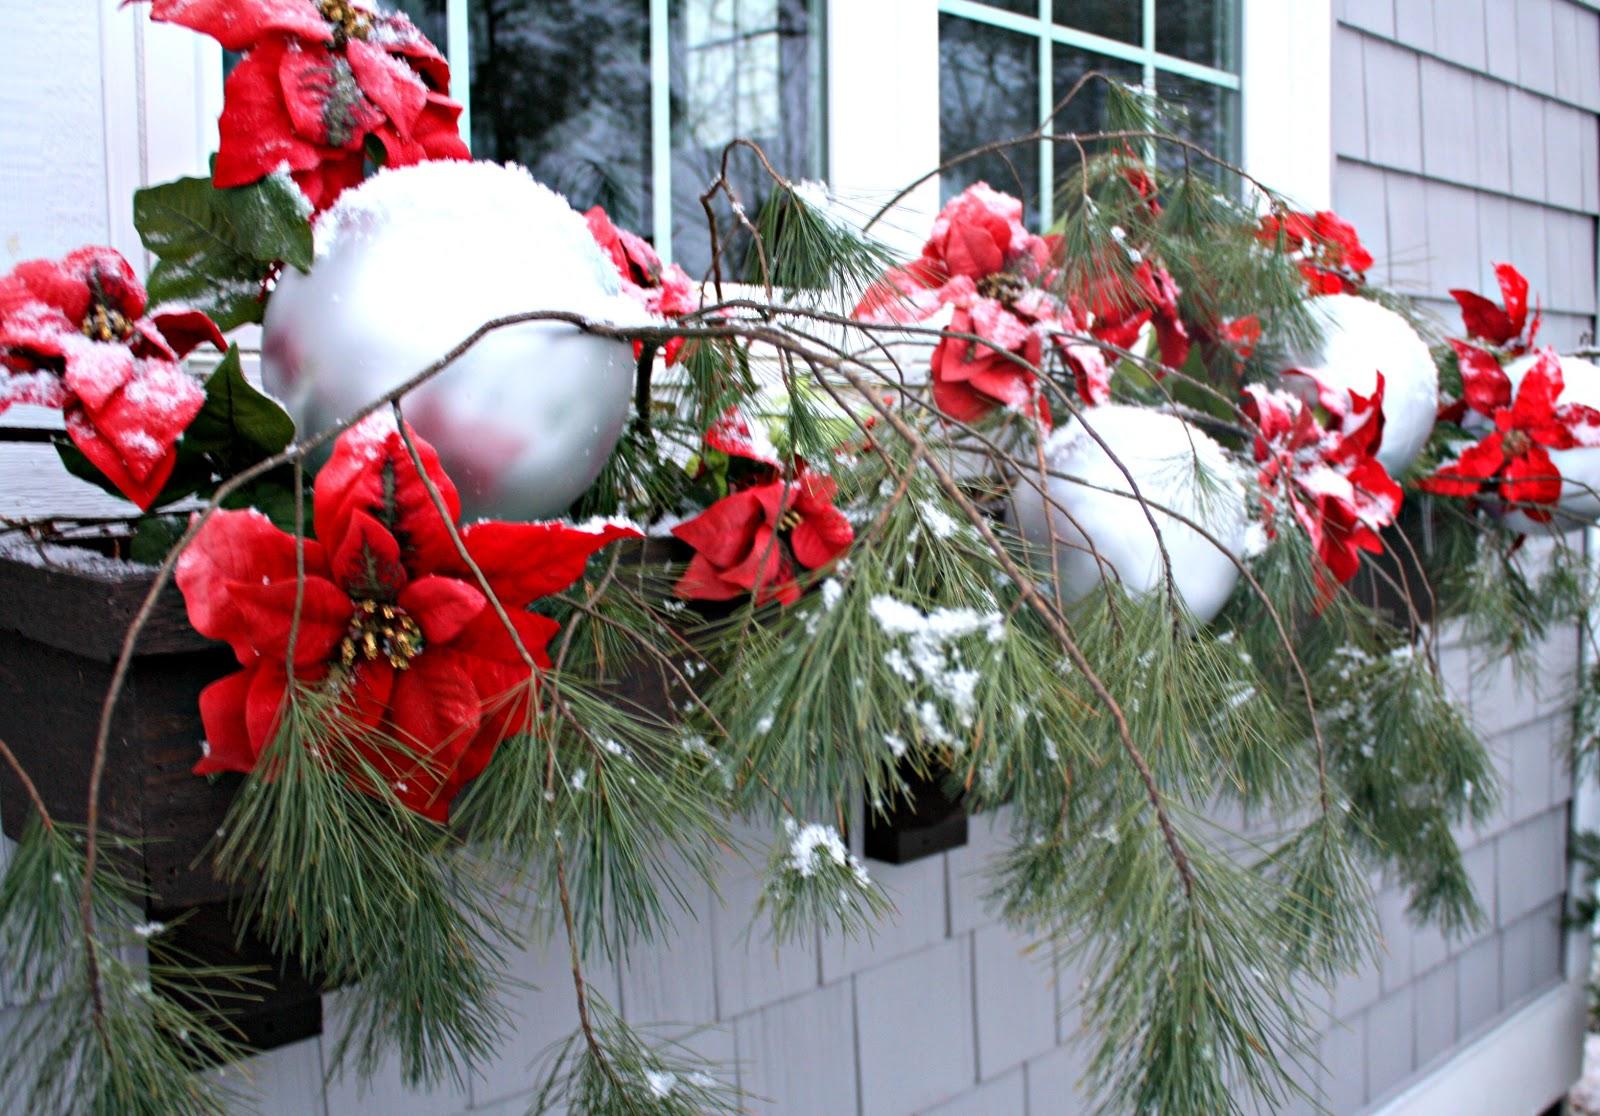 Flower Box Christmas Decorations Psoriasisguru & Christmas Flower Box Decorations - Home Decorating Ideas